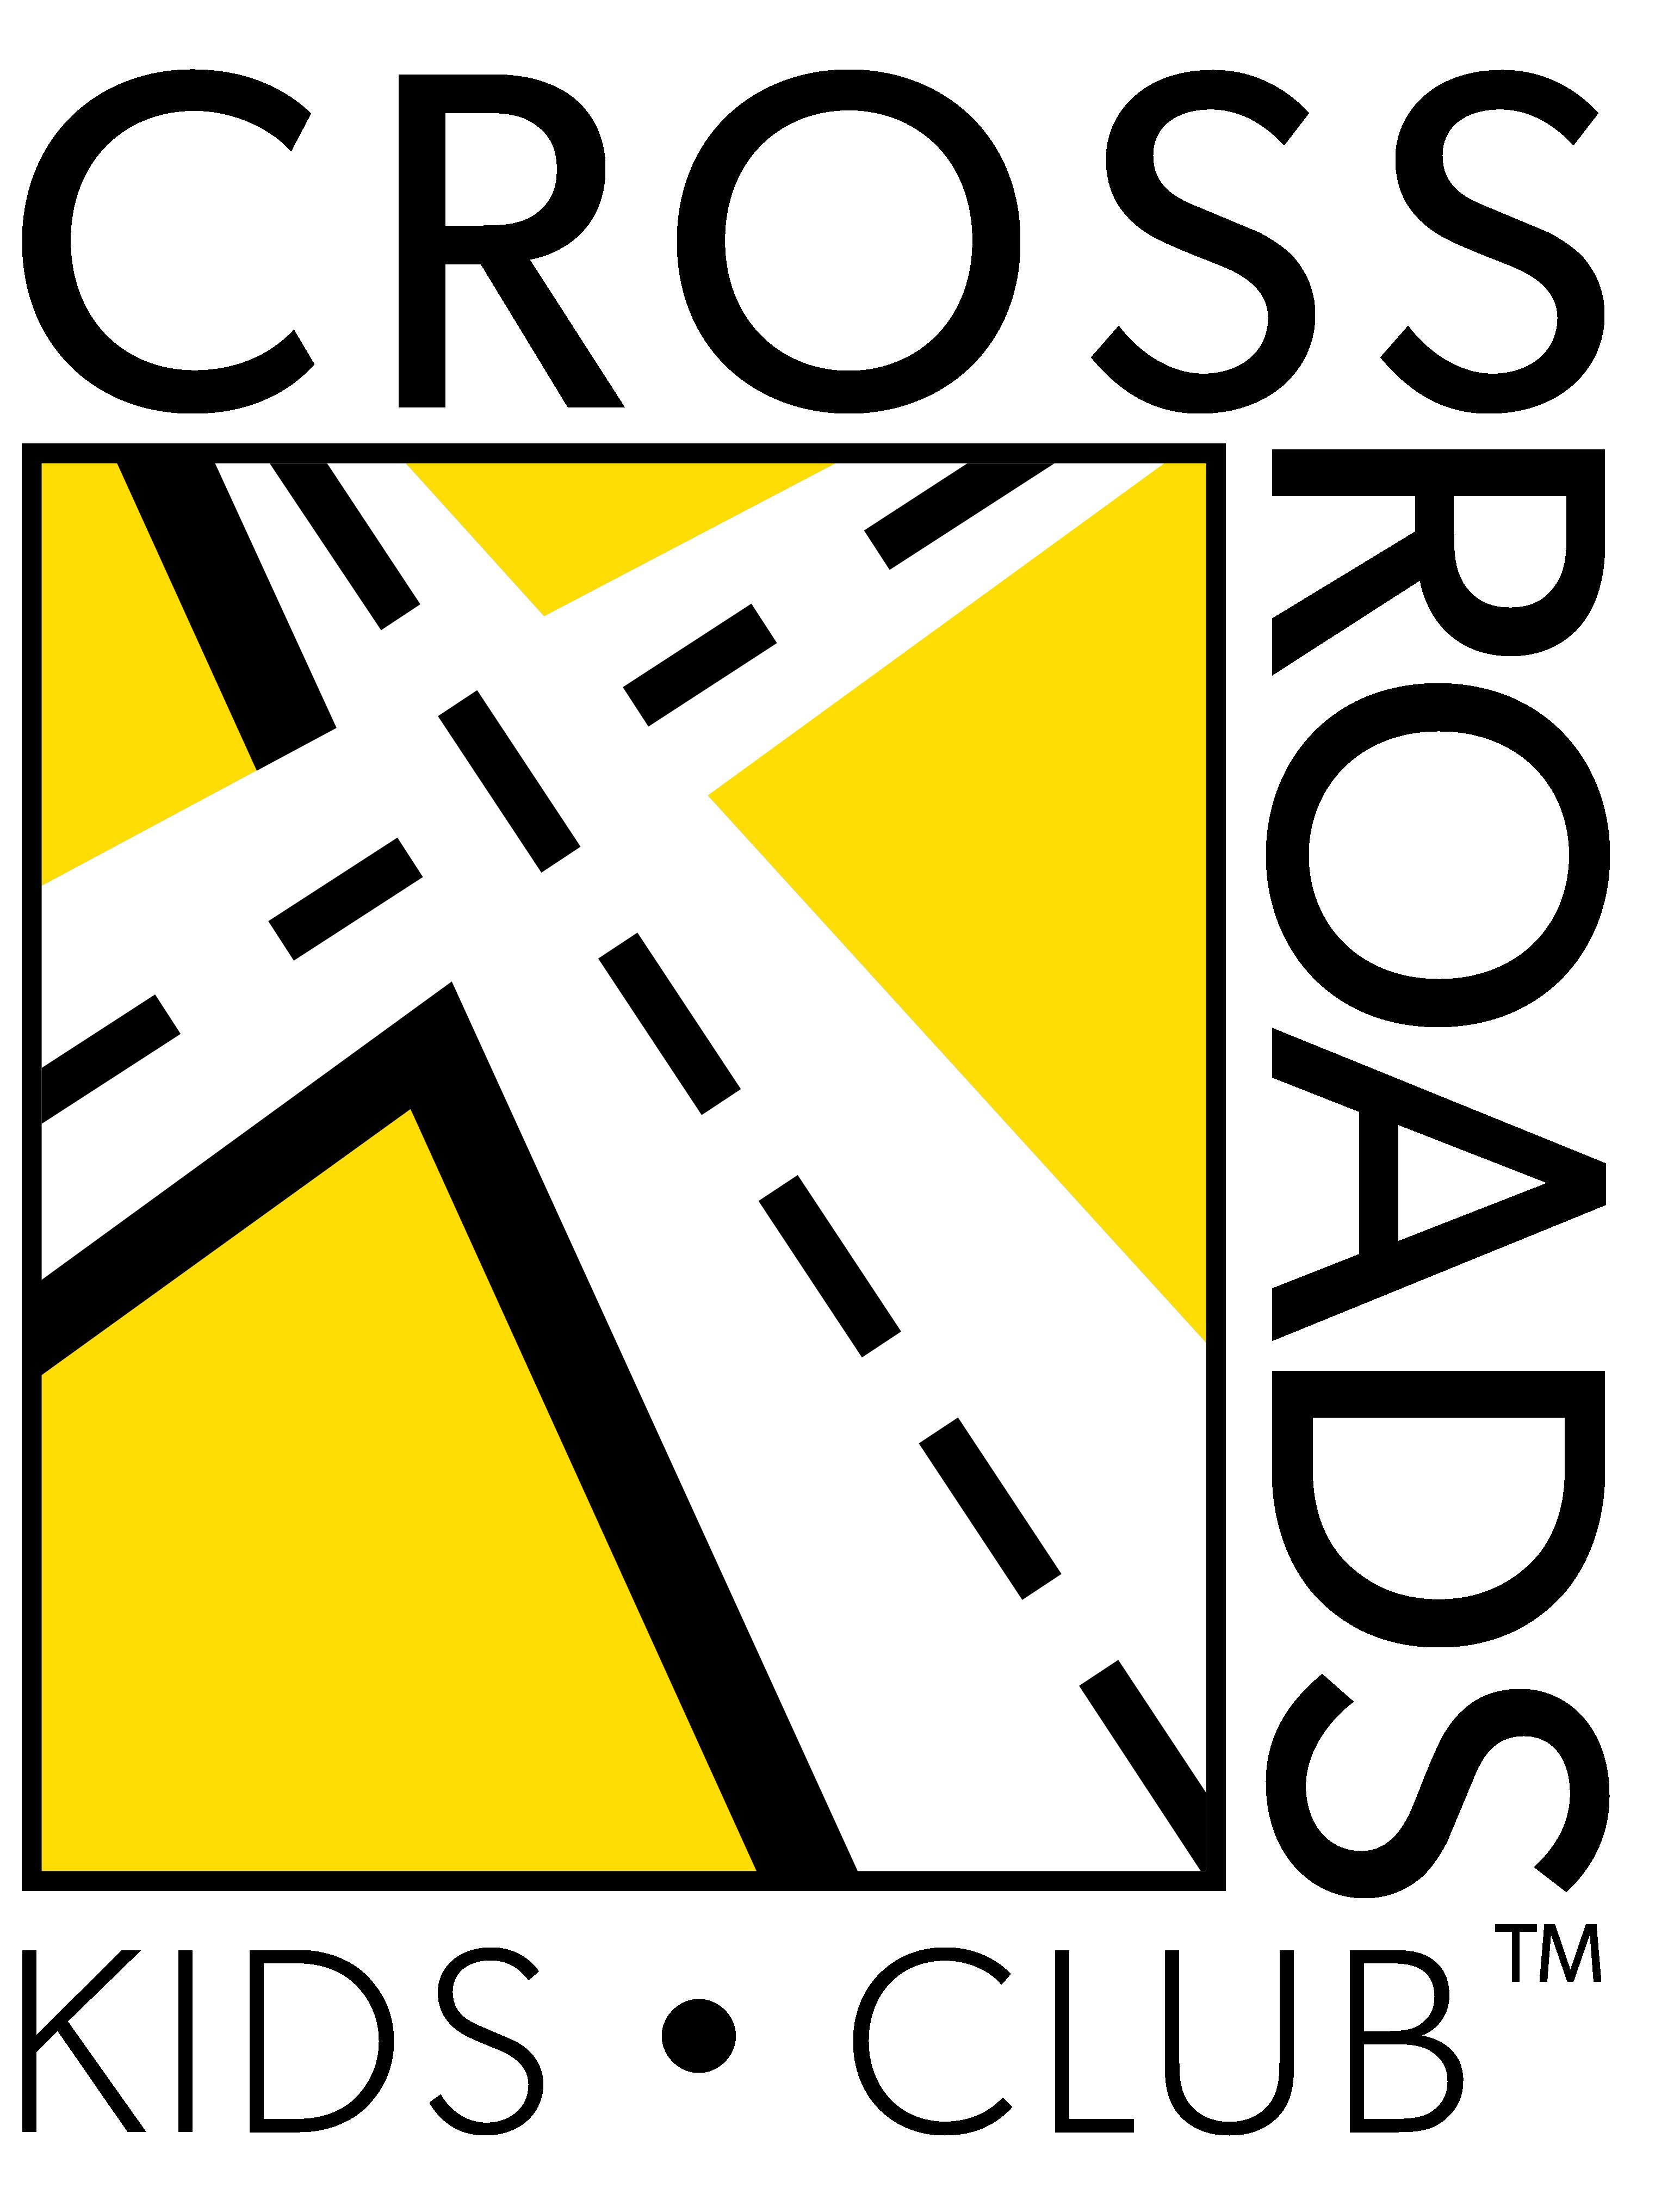 Crossroads Kids Club Job Application Form